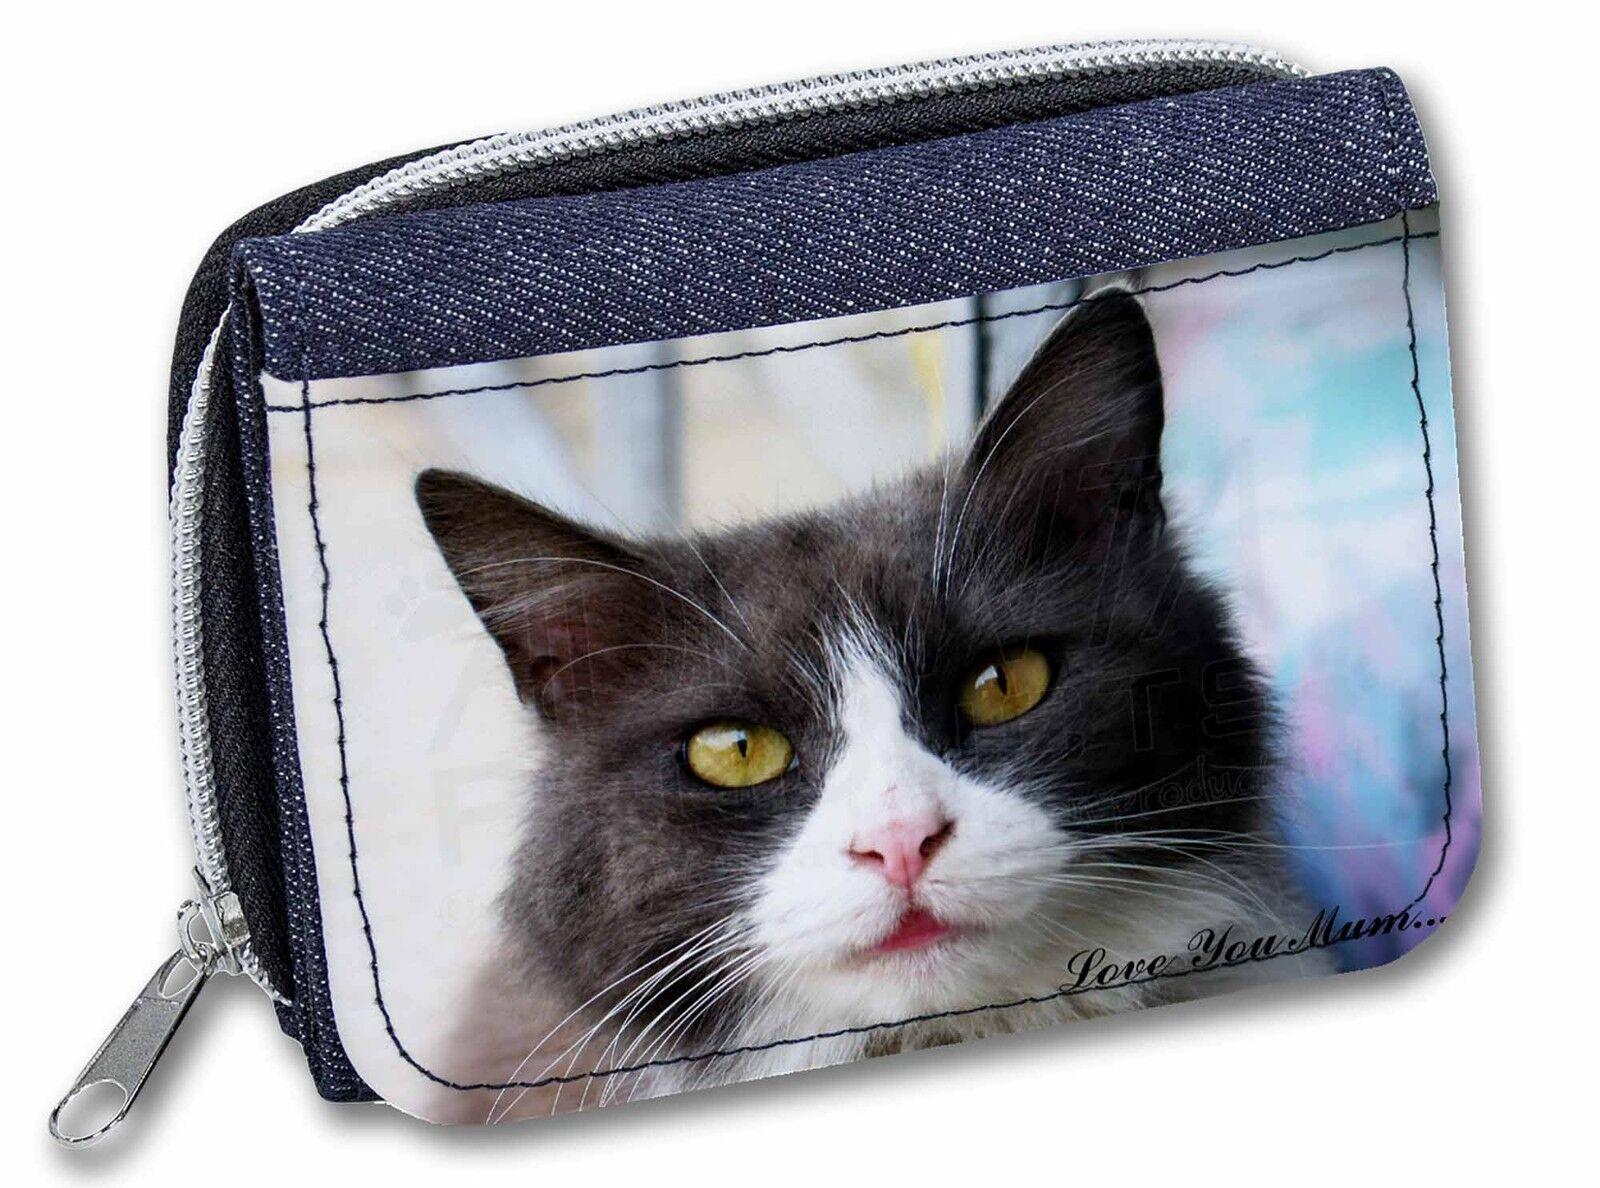 Black and White Cat 'Love You Mum' Girls/Ladies Denim Purse Wallet C, AC-80lymJW